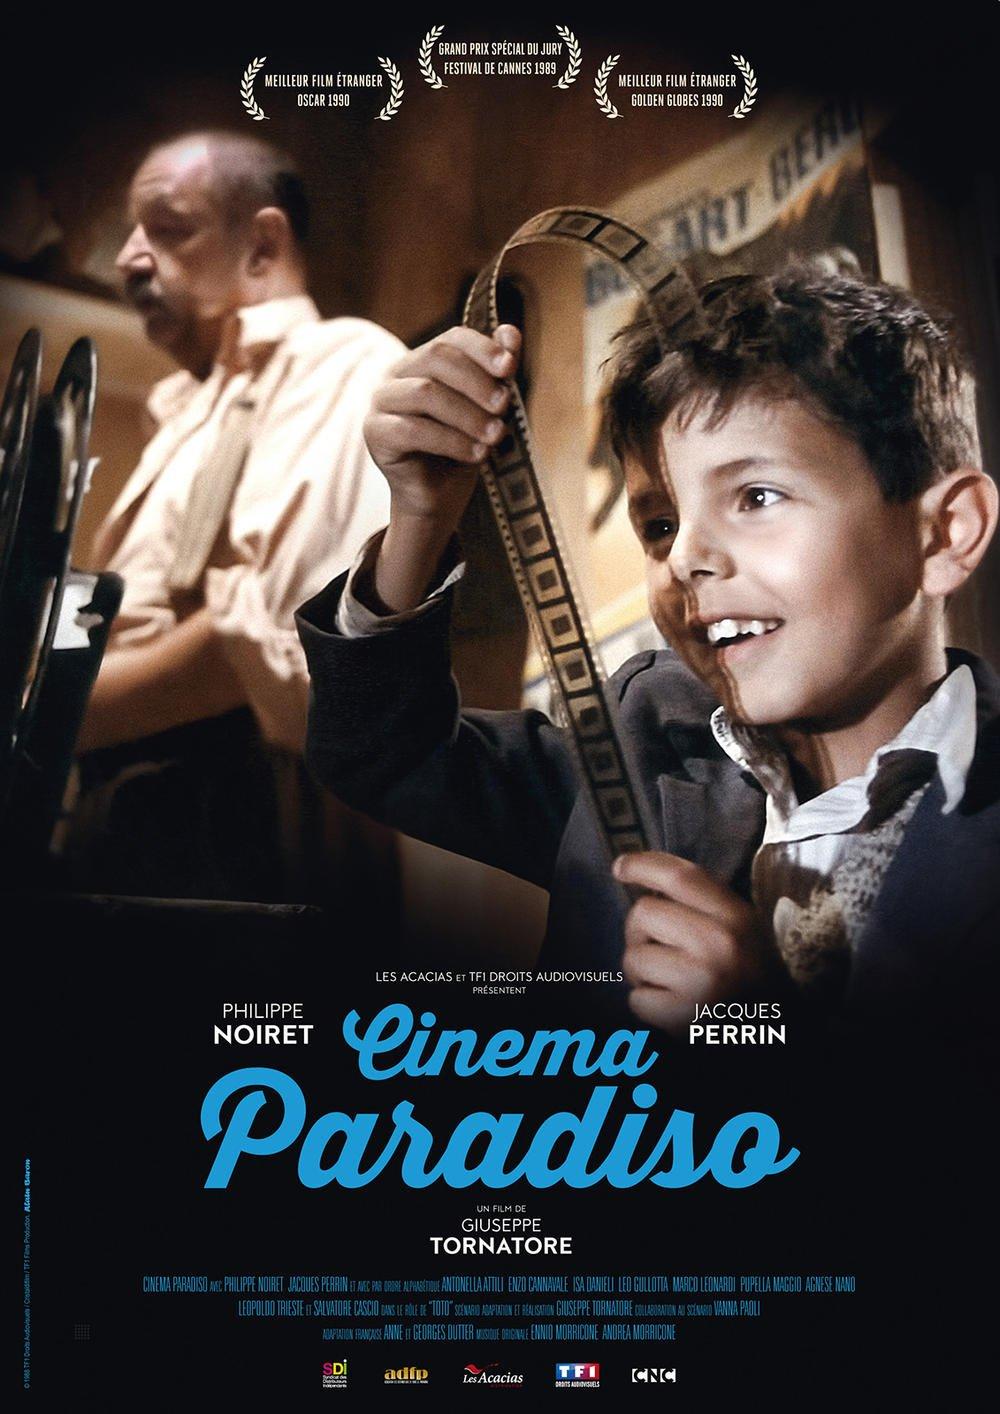 Giuseppe Tornatore : Cinéma Paradiso + The Best Offer Francia DVD ...